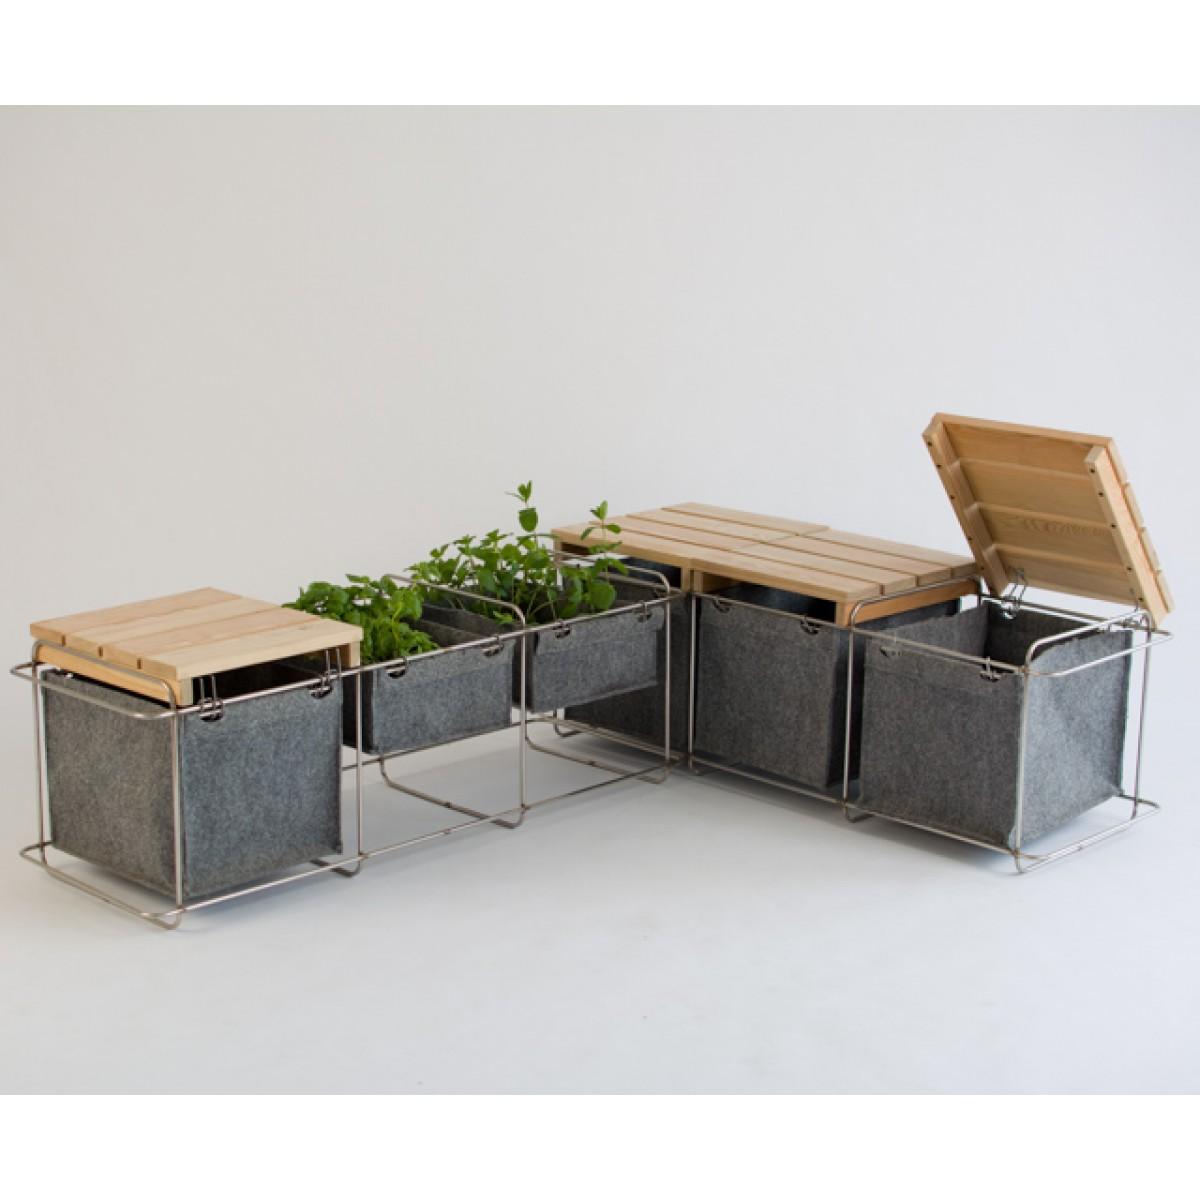 bartmann berlin bank grit gartenm bel. Black Bedroom Furniture Sets. Home Design Ideas